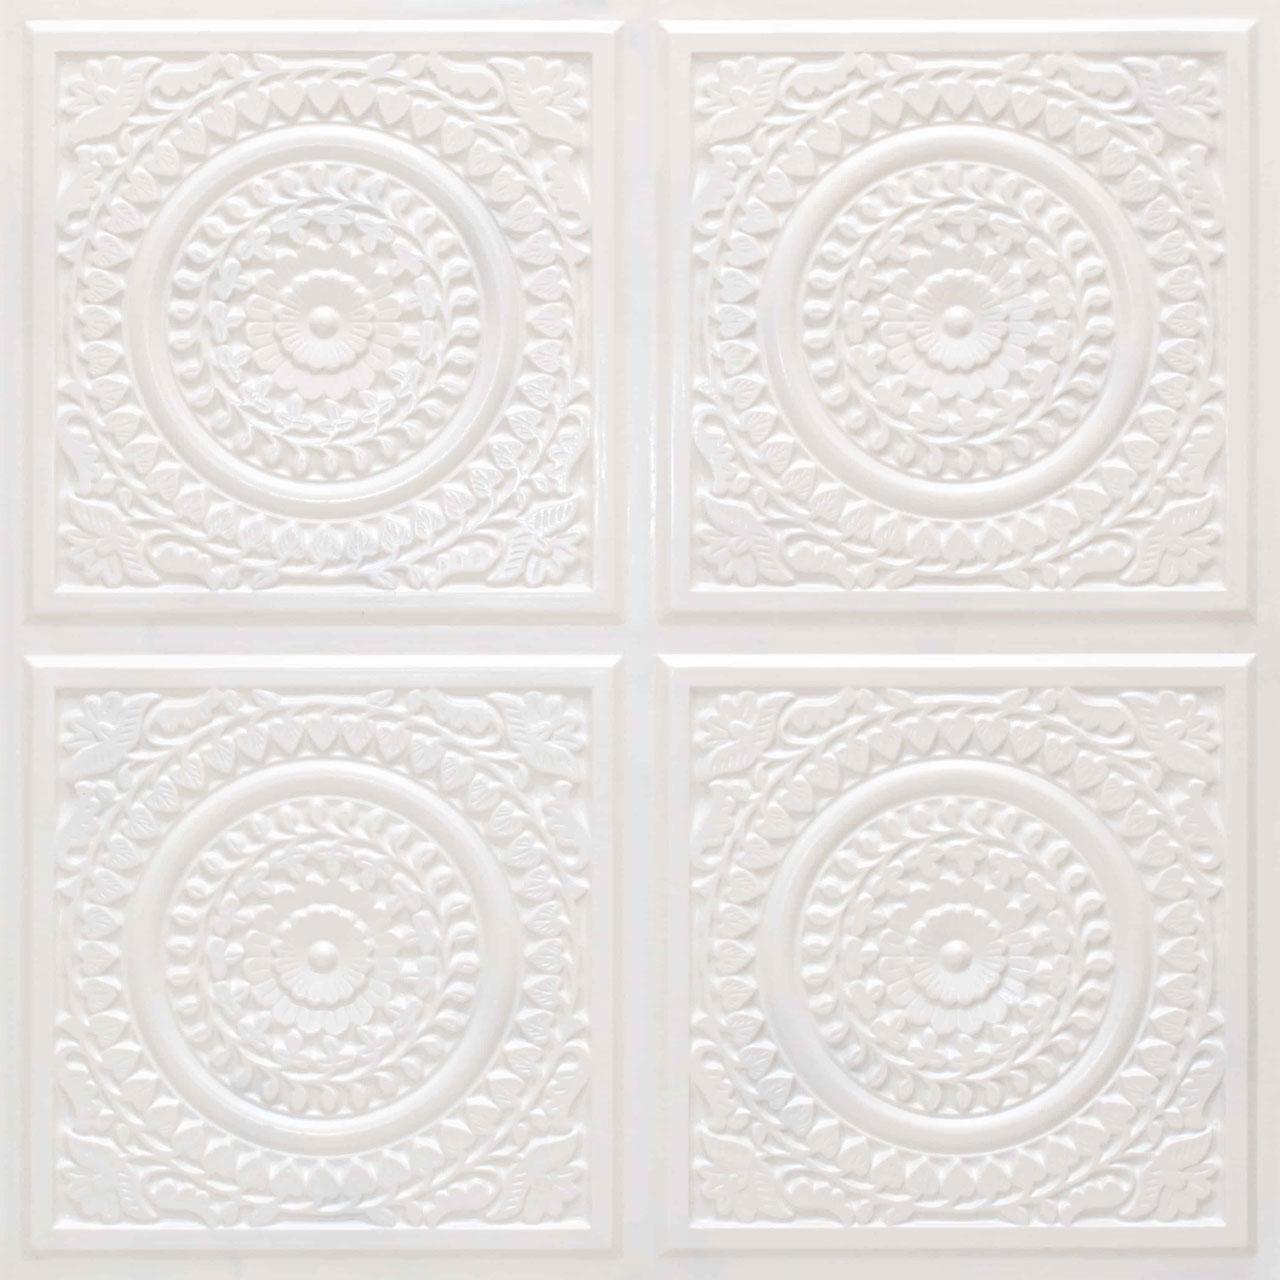 Grandma's Doilies Quartet  Faux Tin Ceiling Tile Glue up 24 in x 24 in - #117